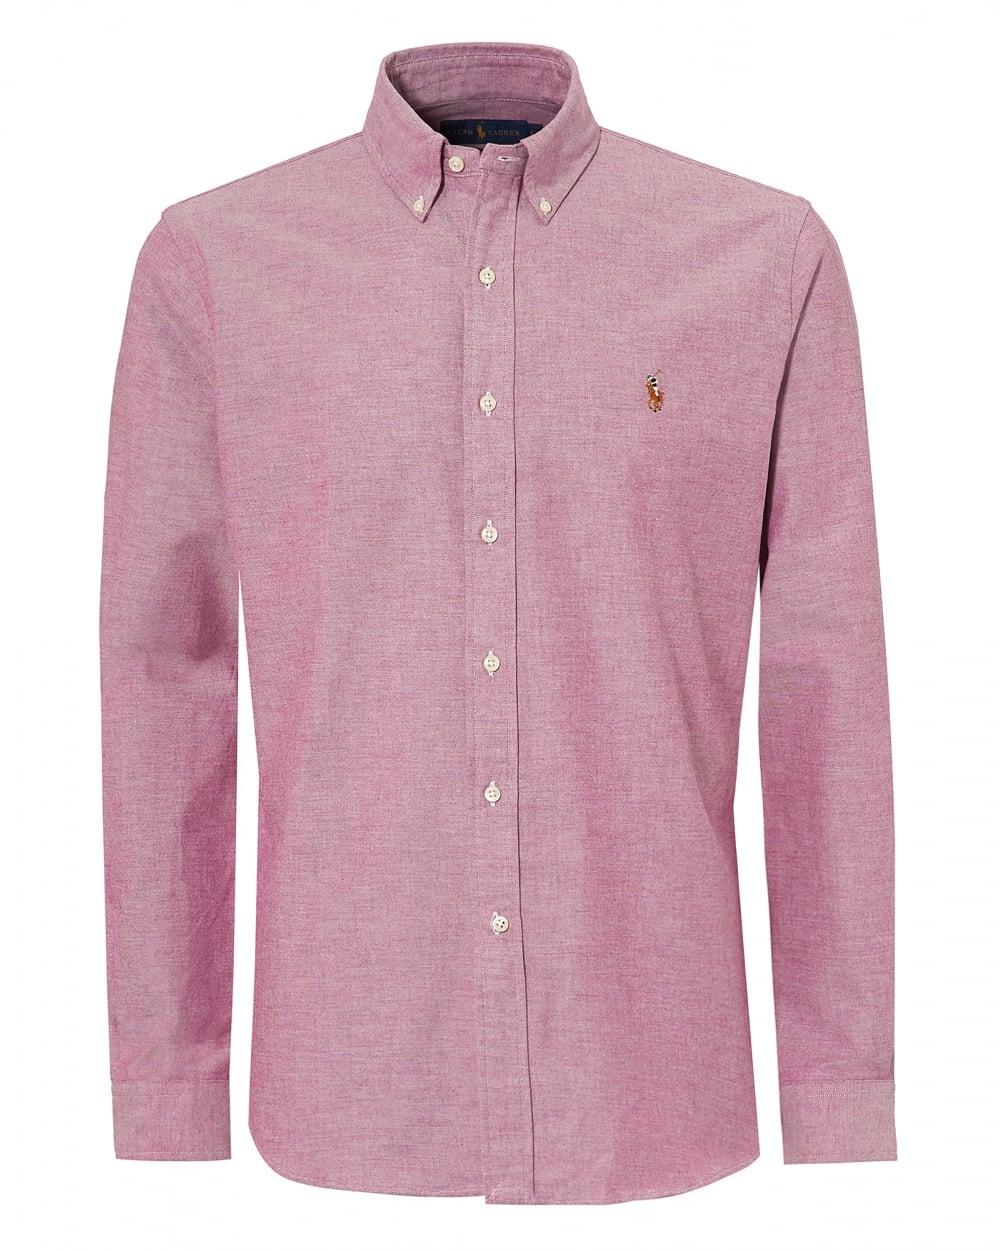 Ralph Lauren Mens Oxford Stretch Slim Fit Pink Shirt